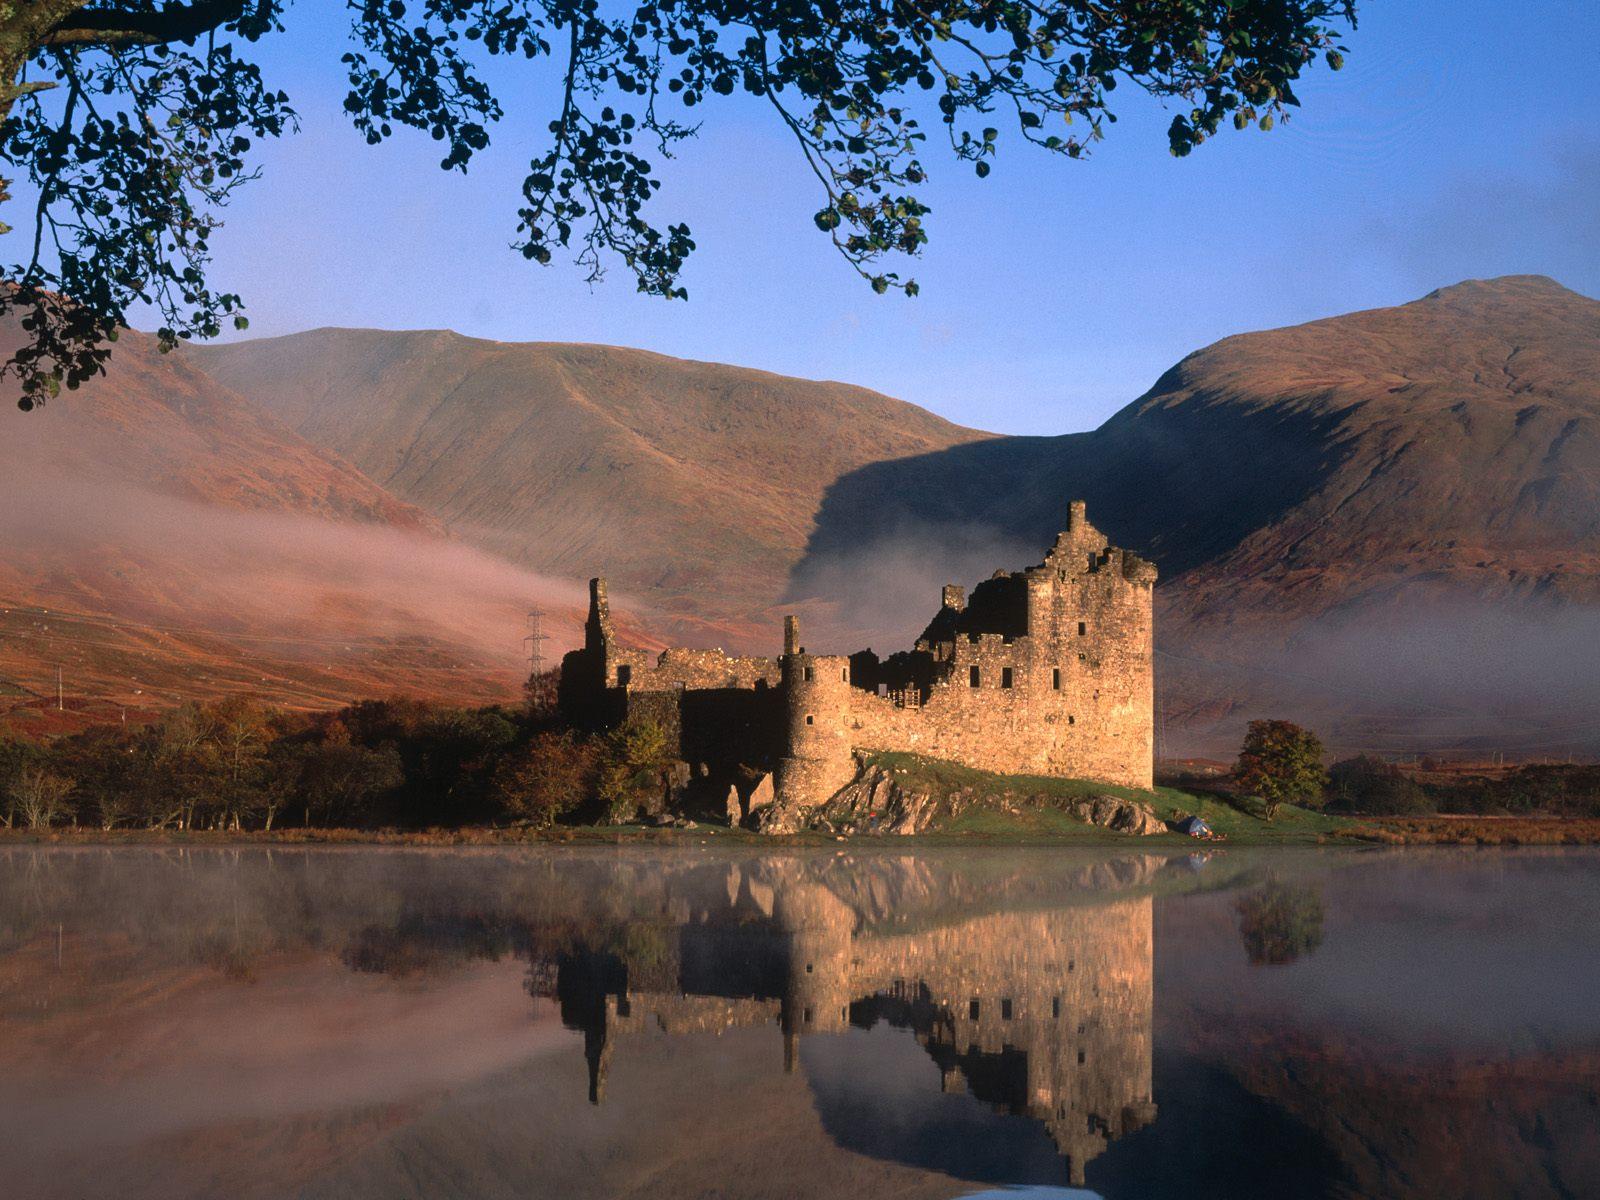 http://1.bp.blogspot.com/_mmBw3uzPnJI/TO6o4E3sPoI/AAAAAAABxfw/bMM9SdffF6Y/s1600/Kilchurn-Castle-Loch-Awe-Scotland.jpg